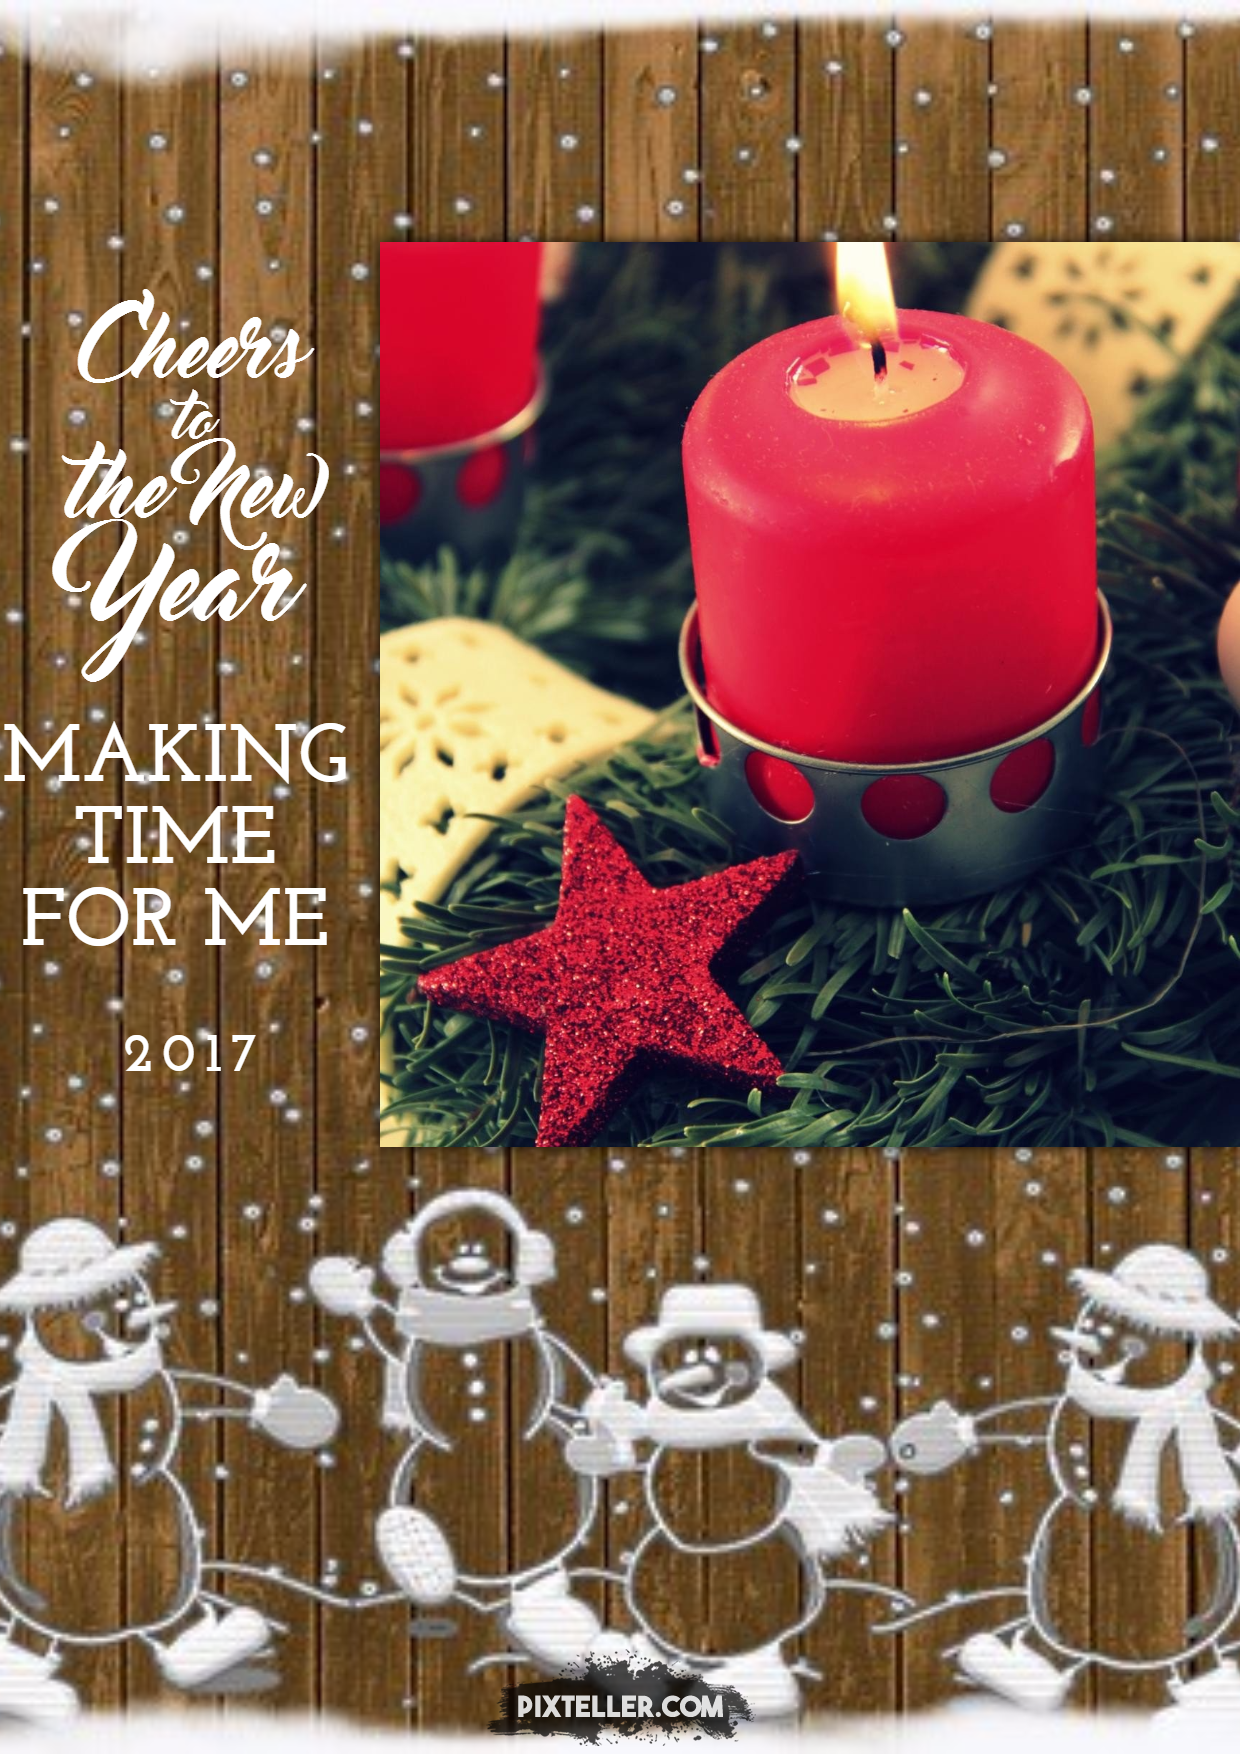 Christmas,                Decoration,                Lighting,                Pattern,                2017,                Anniversary,                Mockup,                White,                Black,                Red,                 Free Image